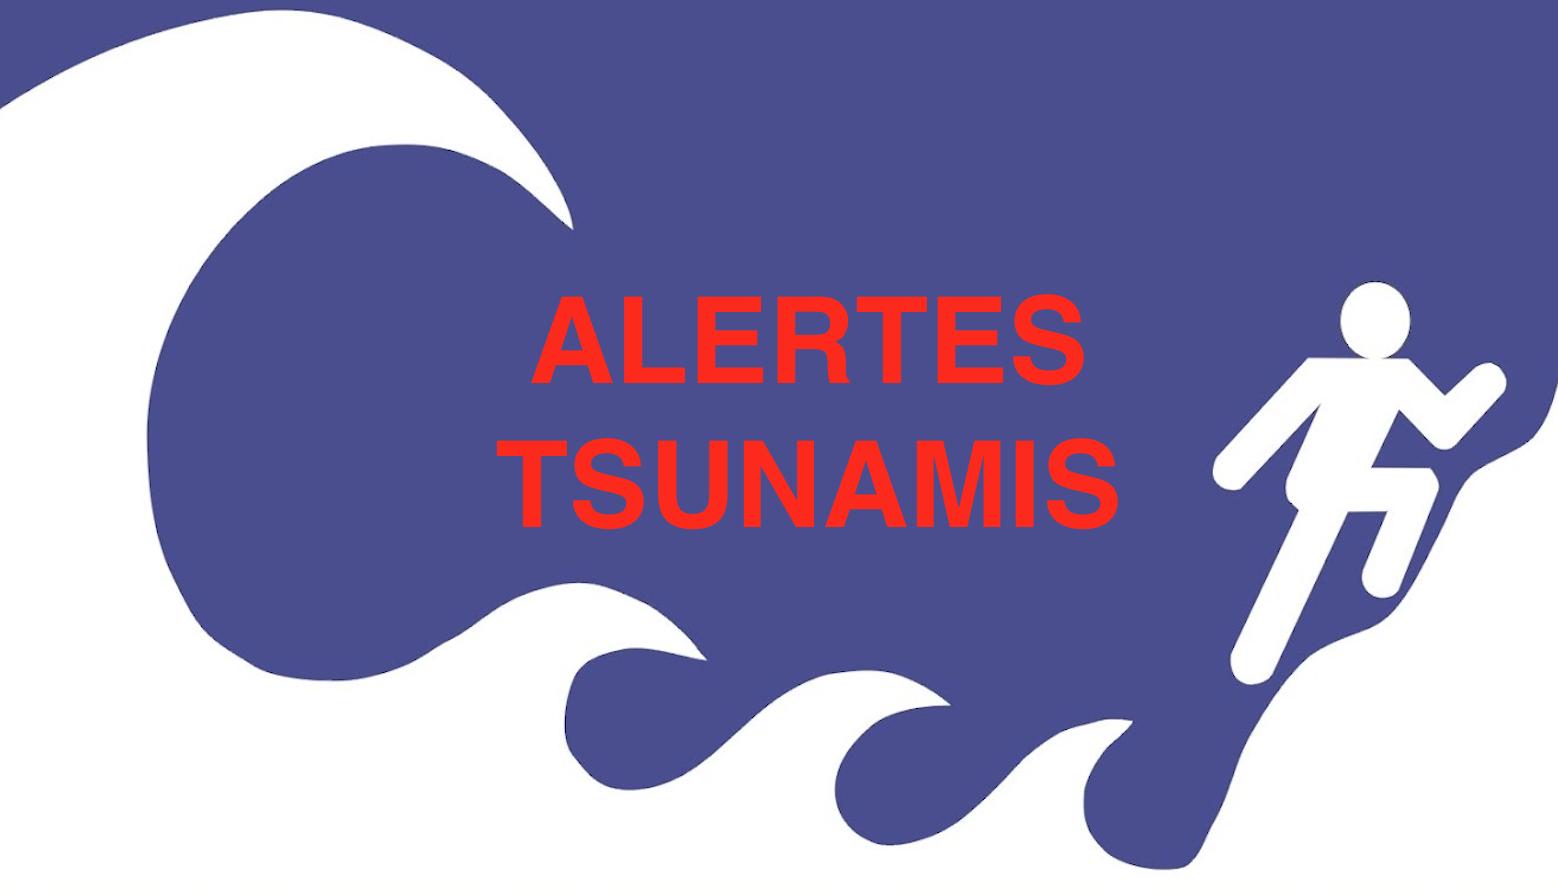 Alertes tsunamis NWS